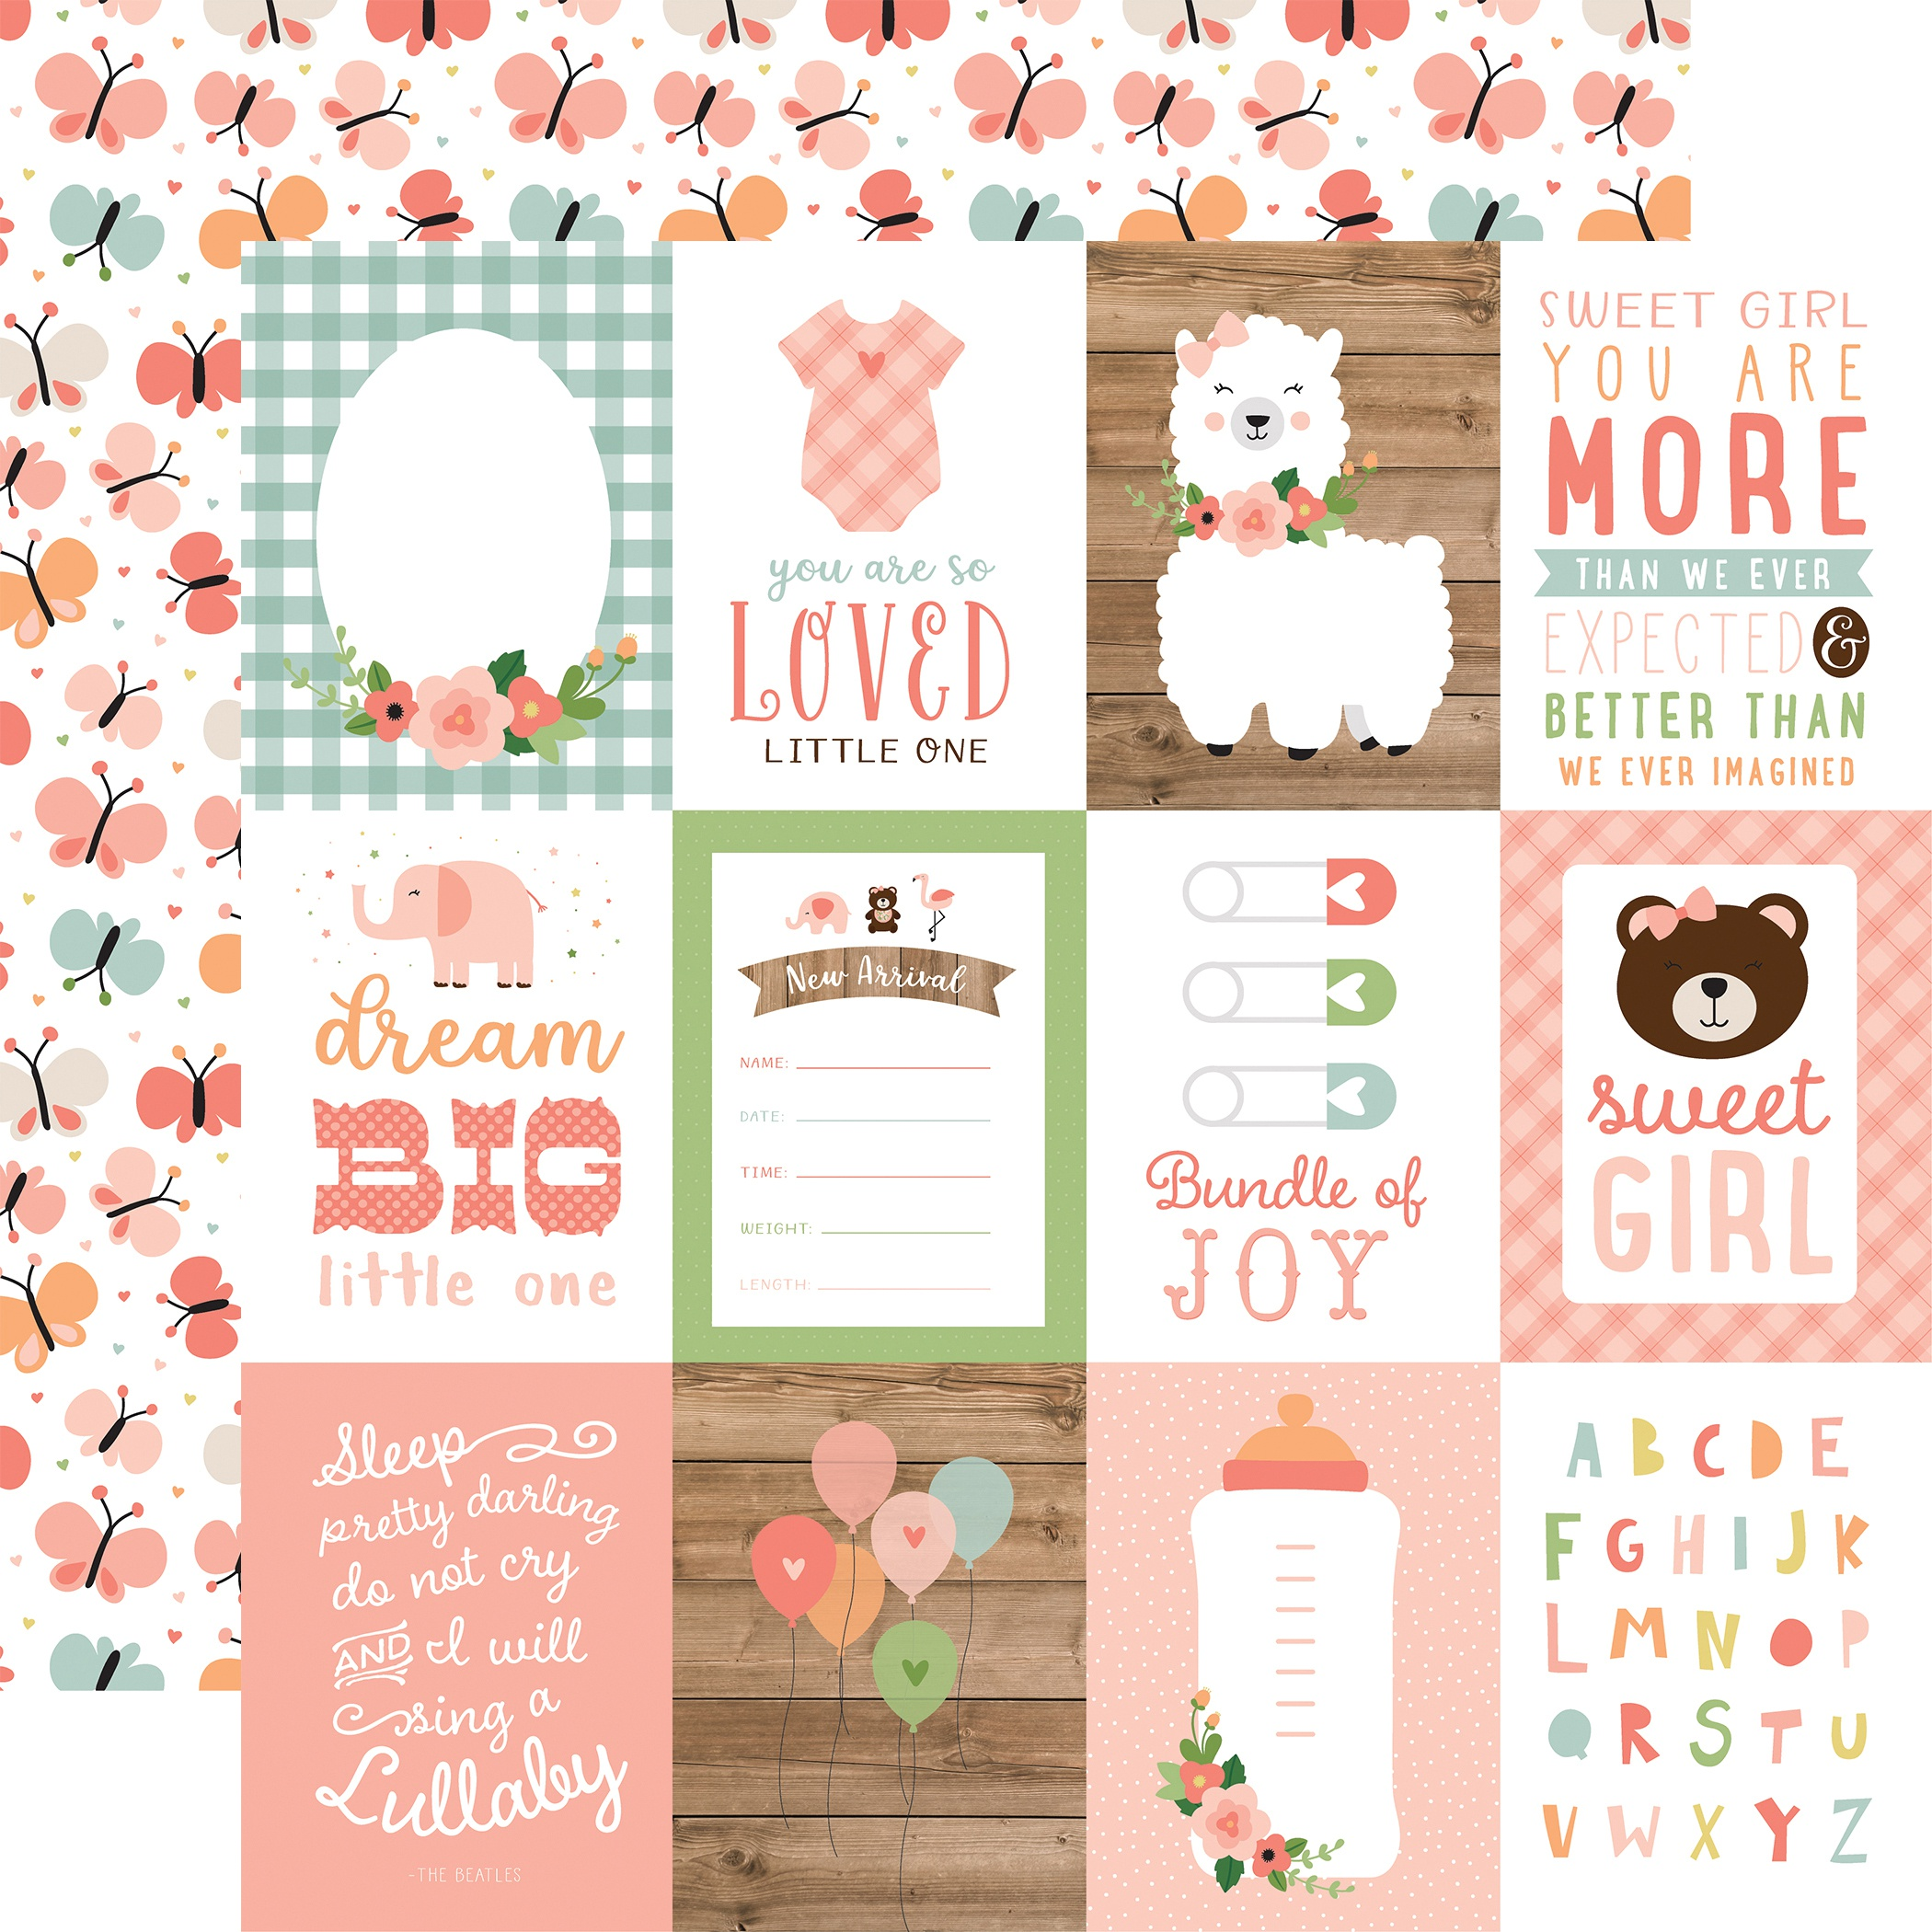 Baby Girl - 3x4 Journaling Cards